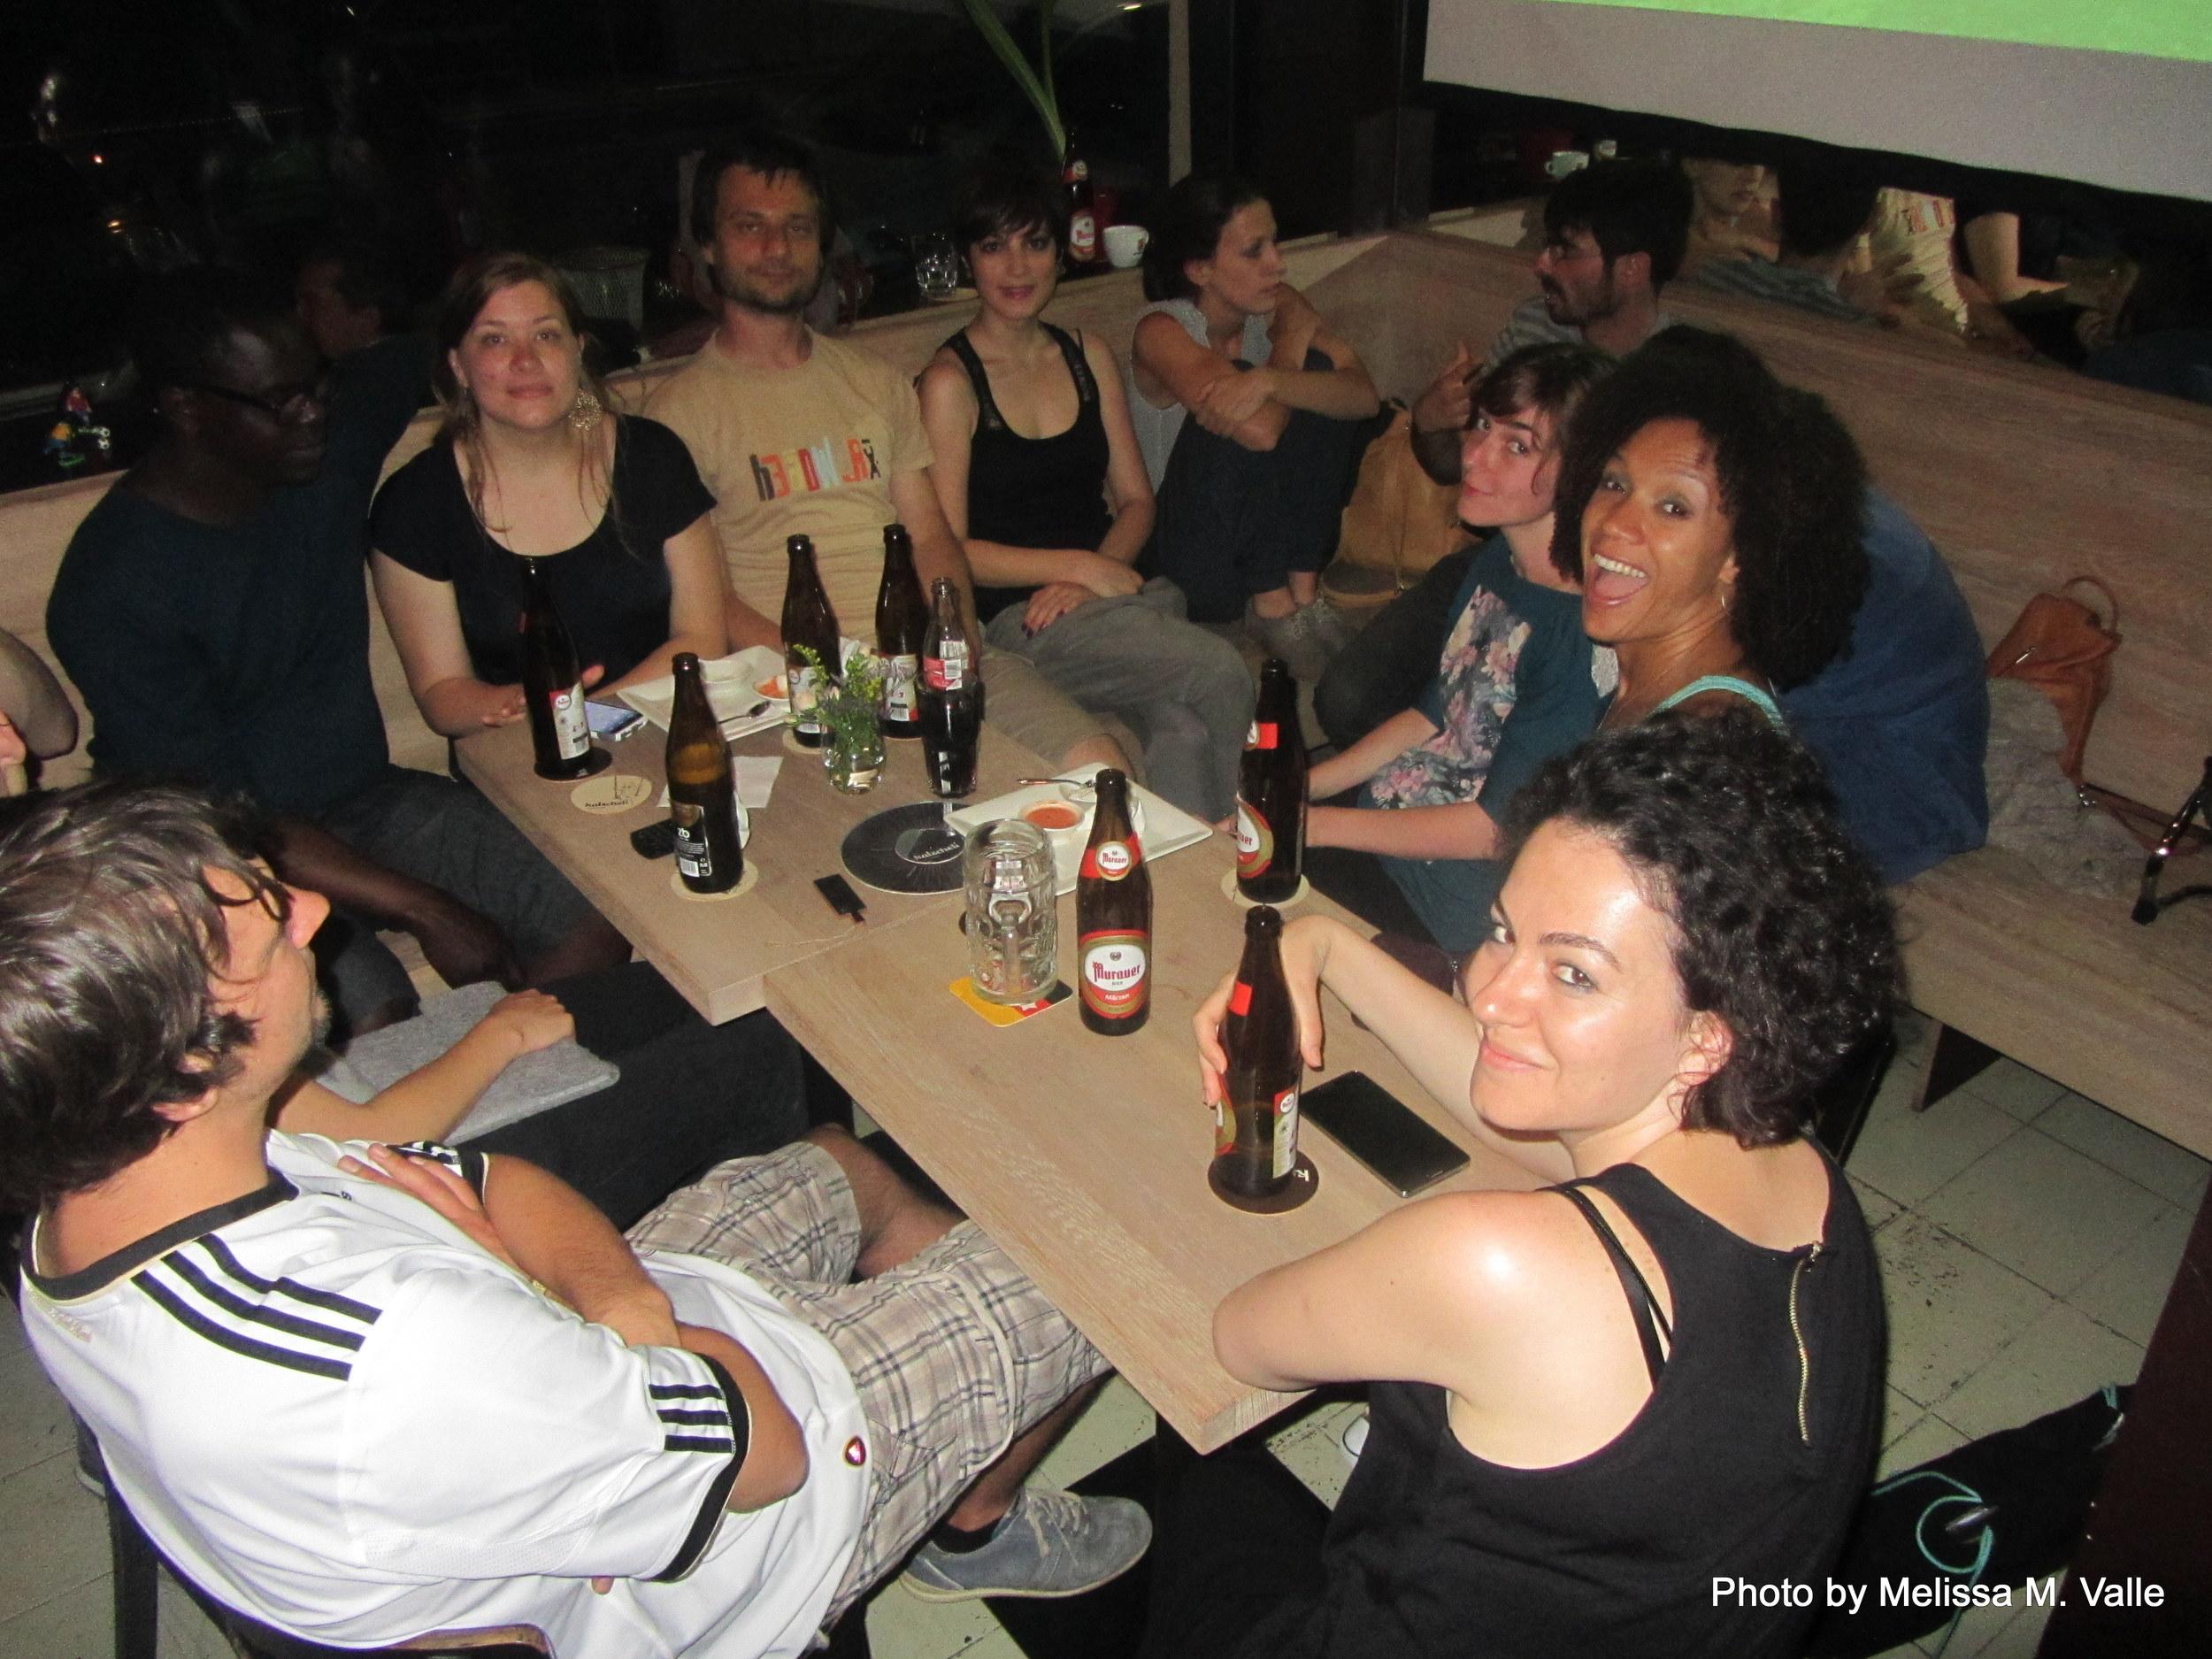 7.8.14 Vienna, Austria-Watching Brasil v Germany world cup match (8).JPG